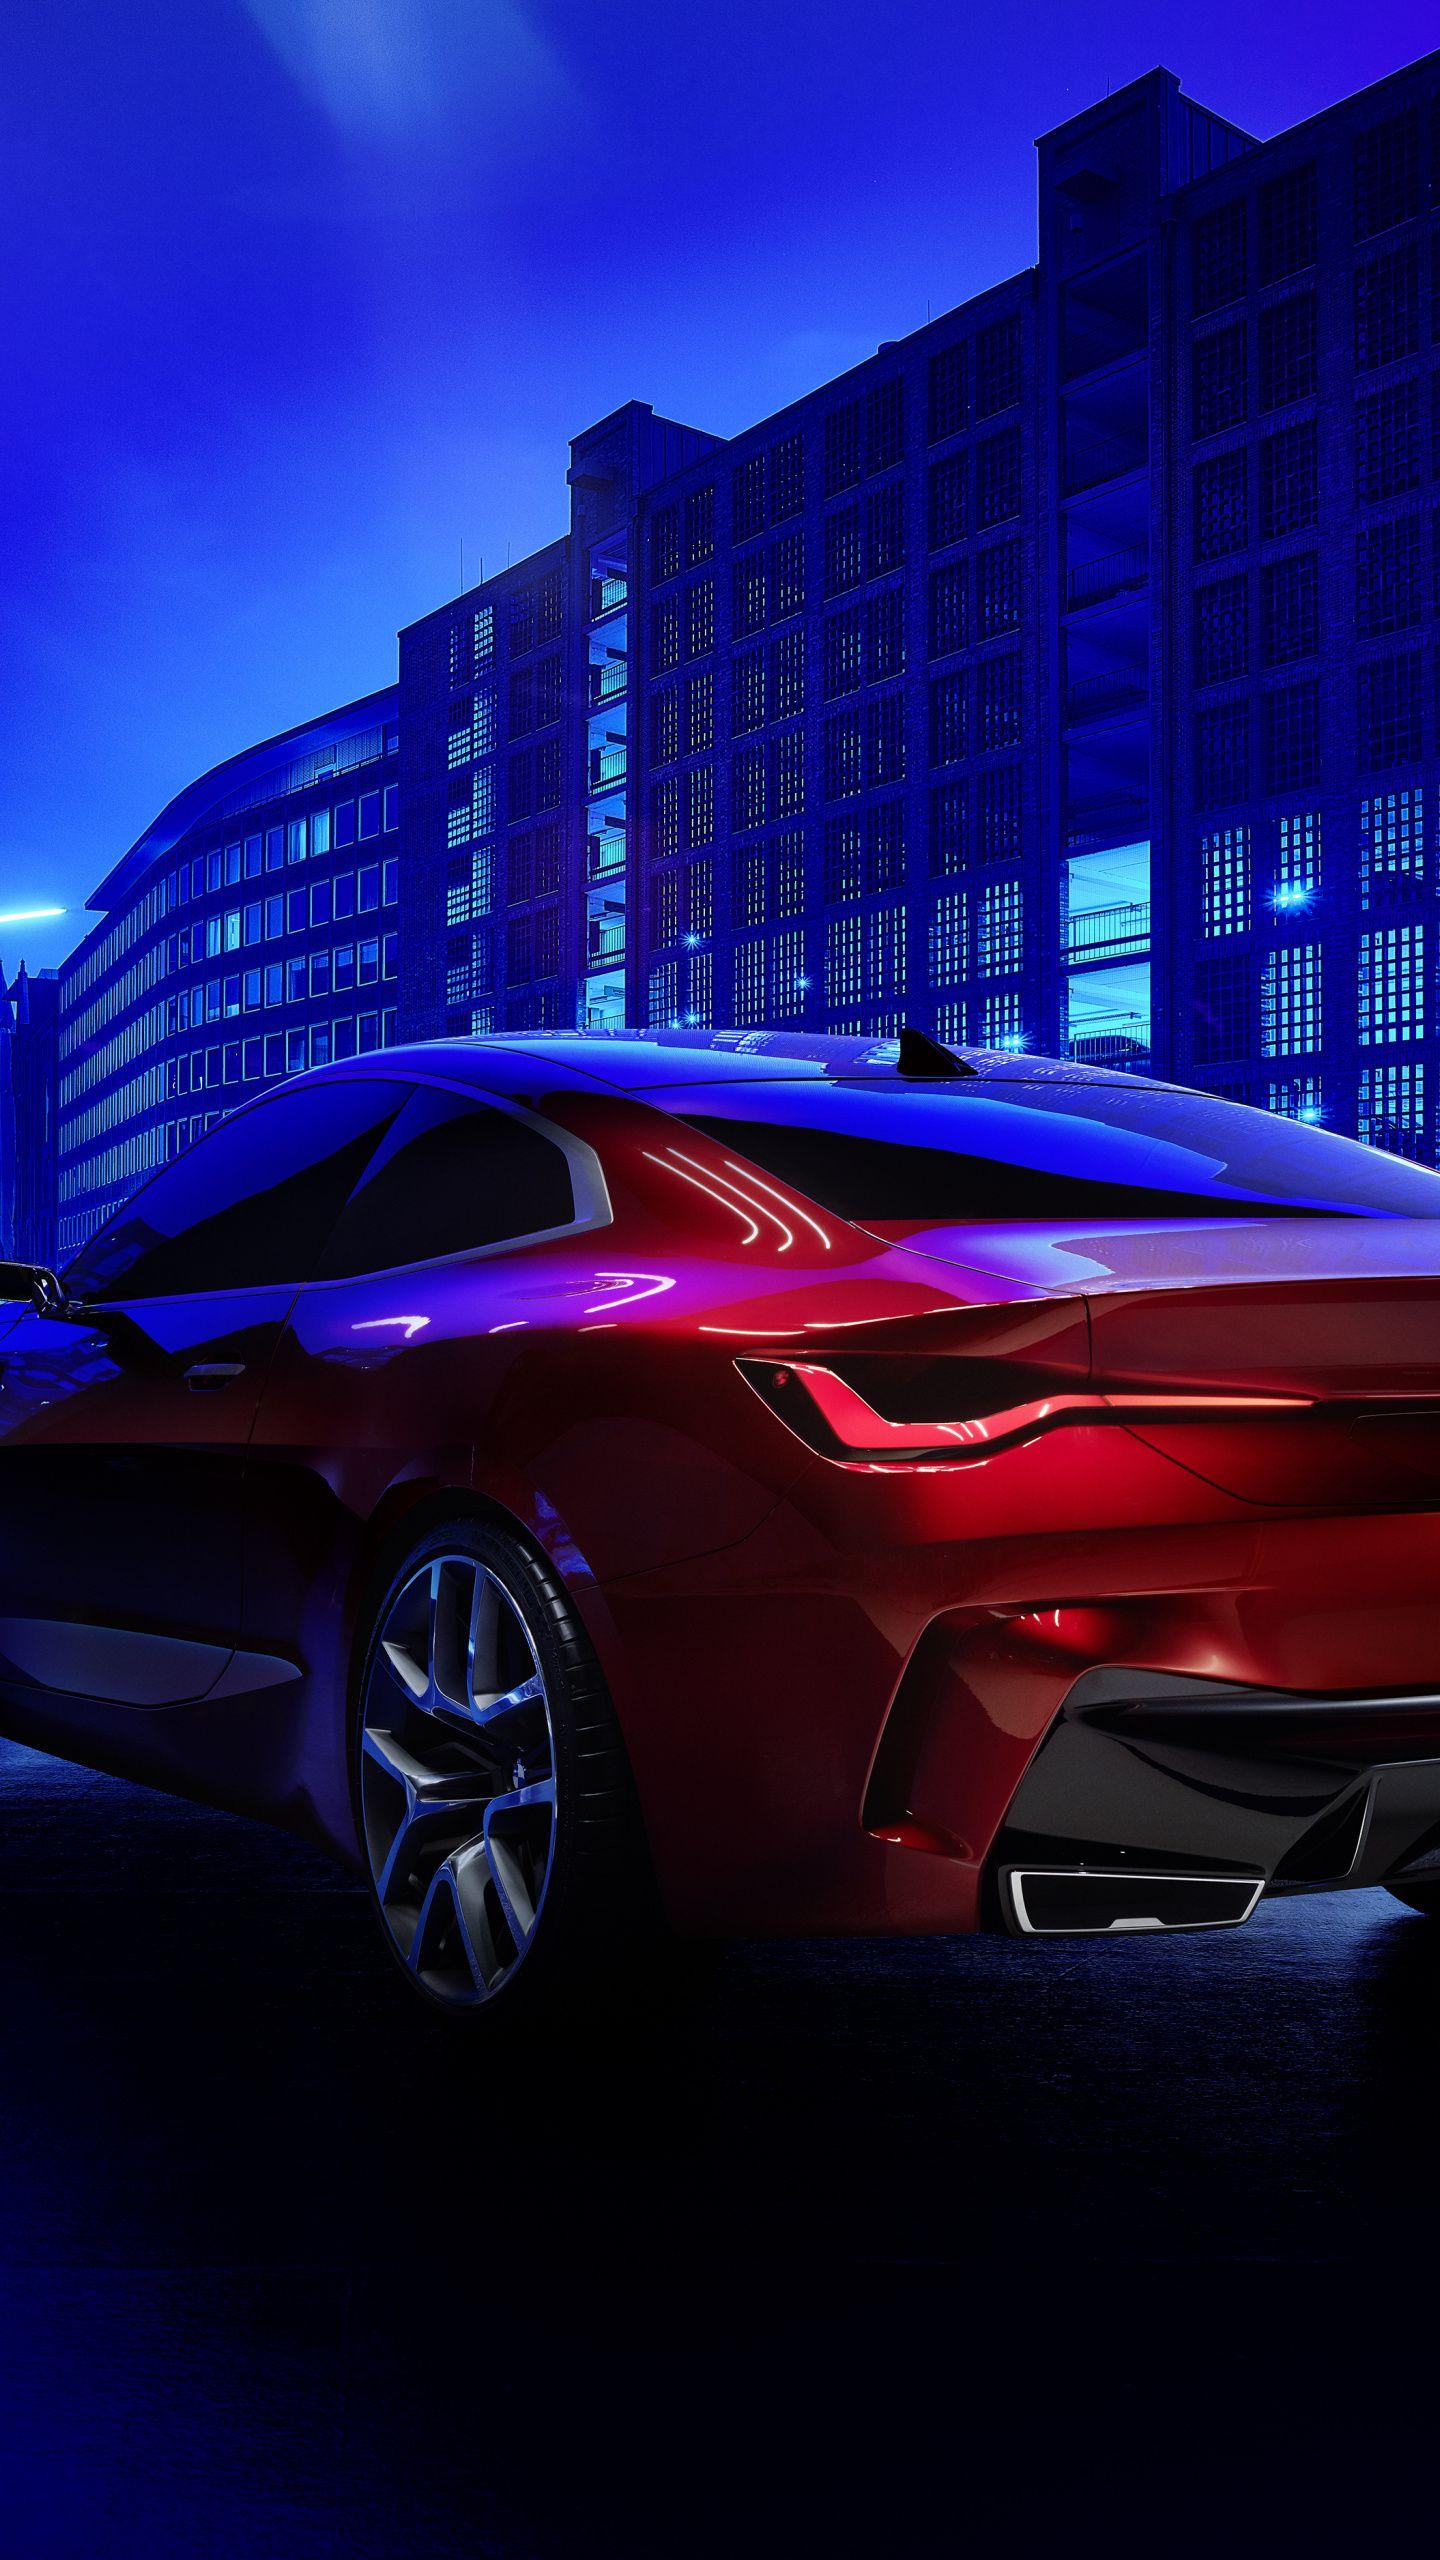 1440x2560 Stunning Car Bmw Concept 4 Rear View Wallpaper Bmw Concept Bmw View Wallpaper